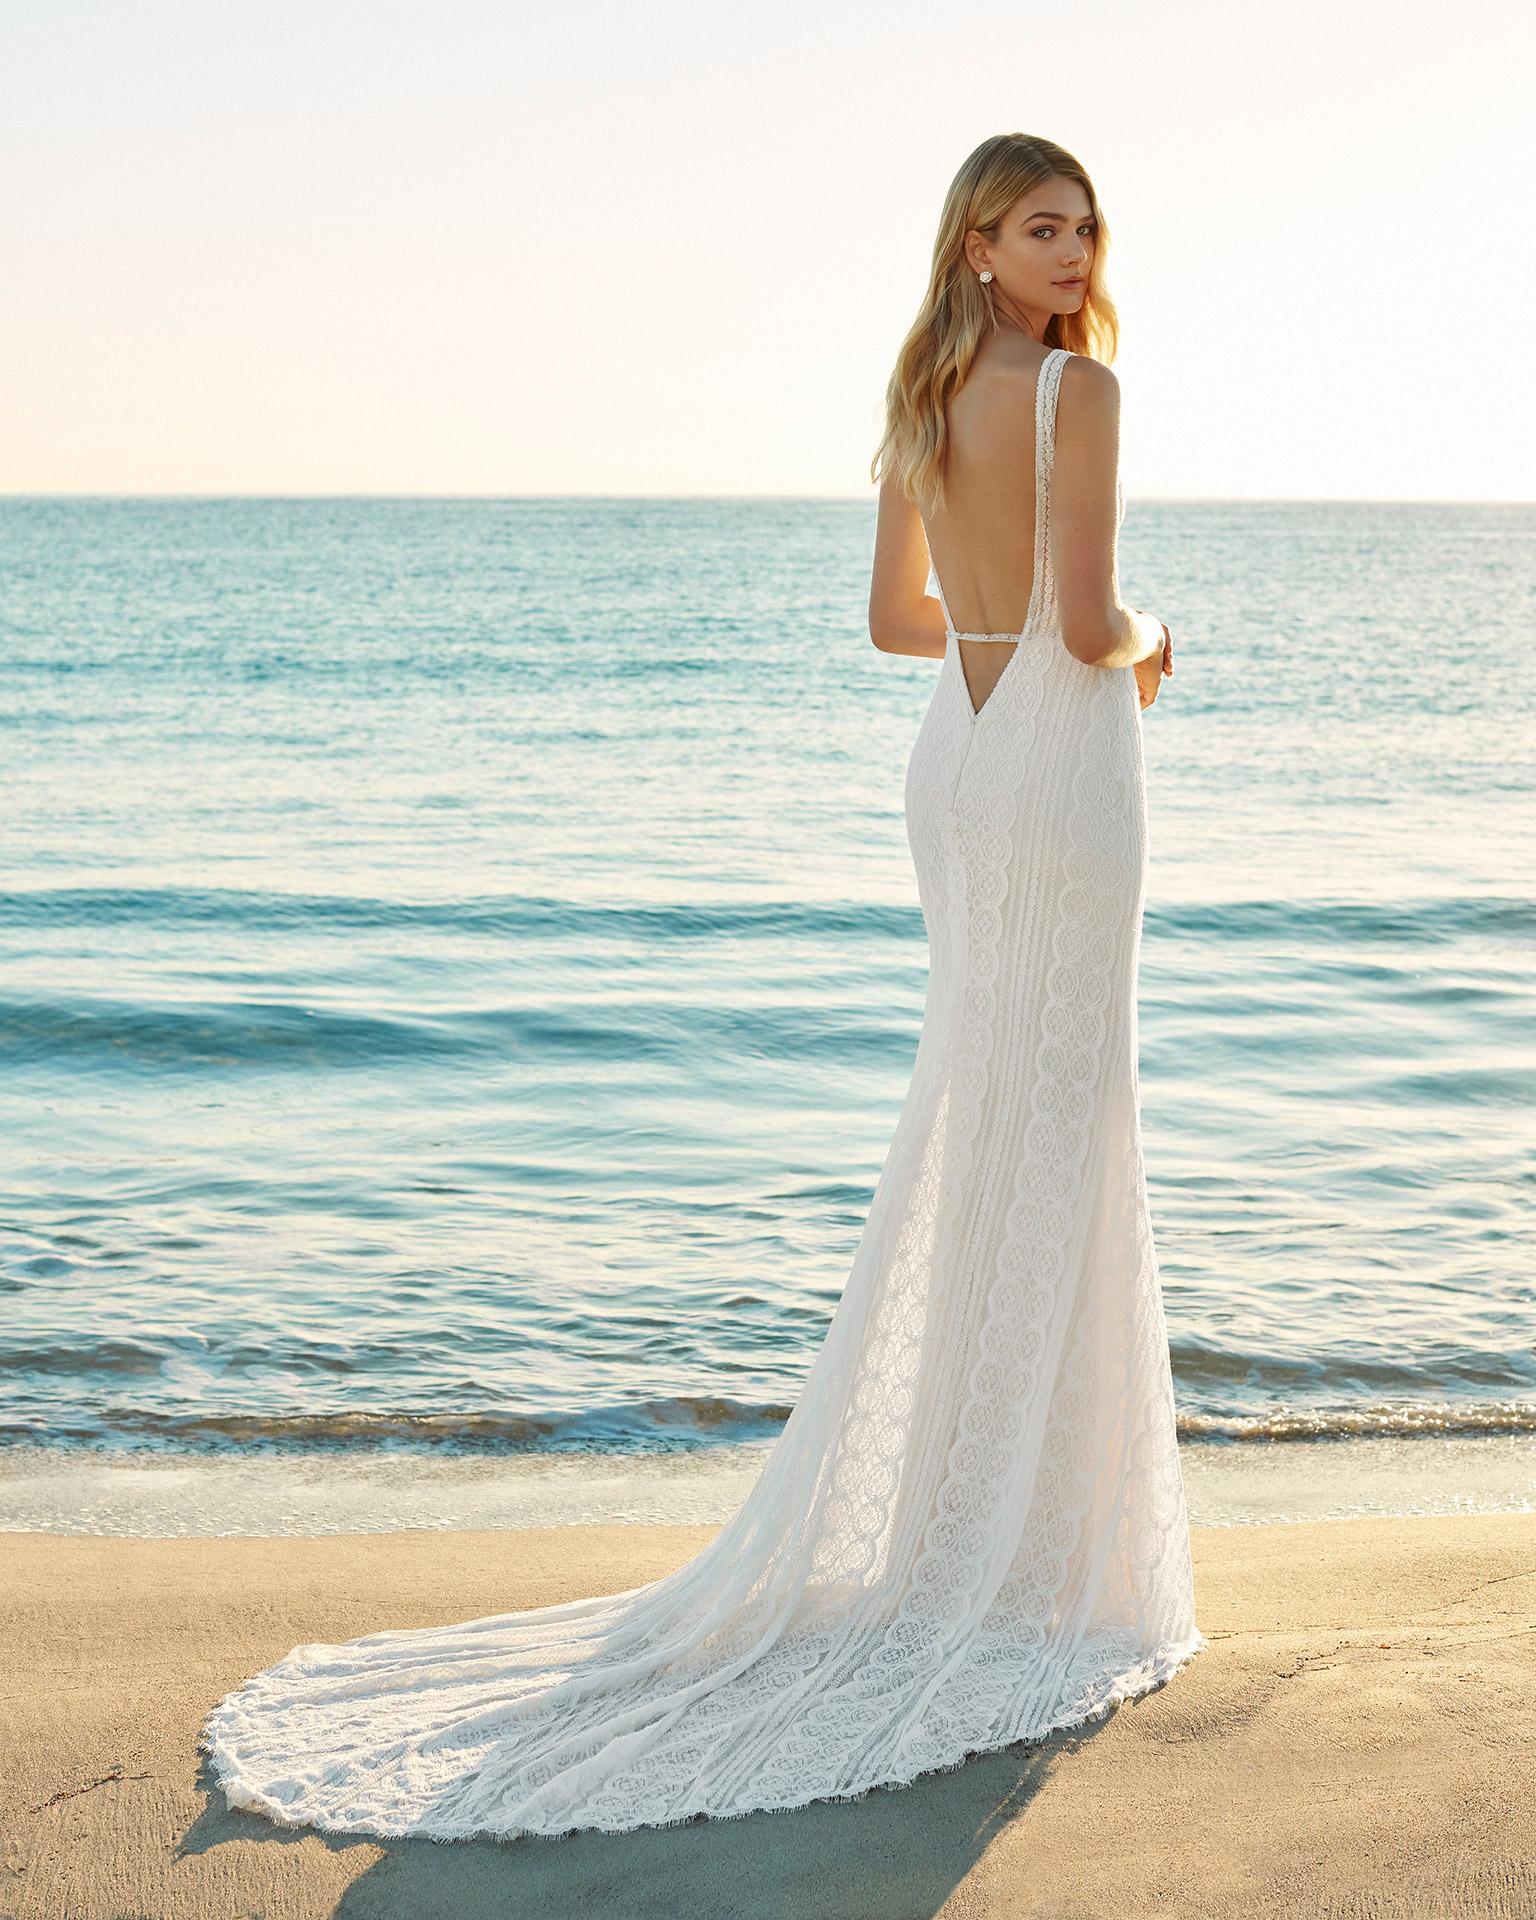 Gaura Bridal 2020 Aire Beach Wedding Collection